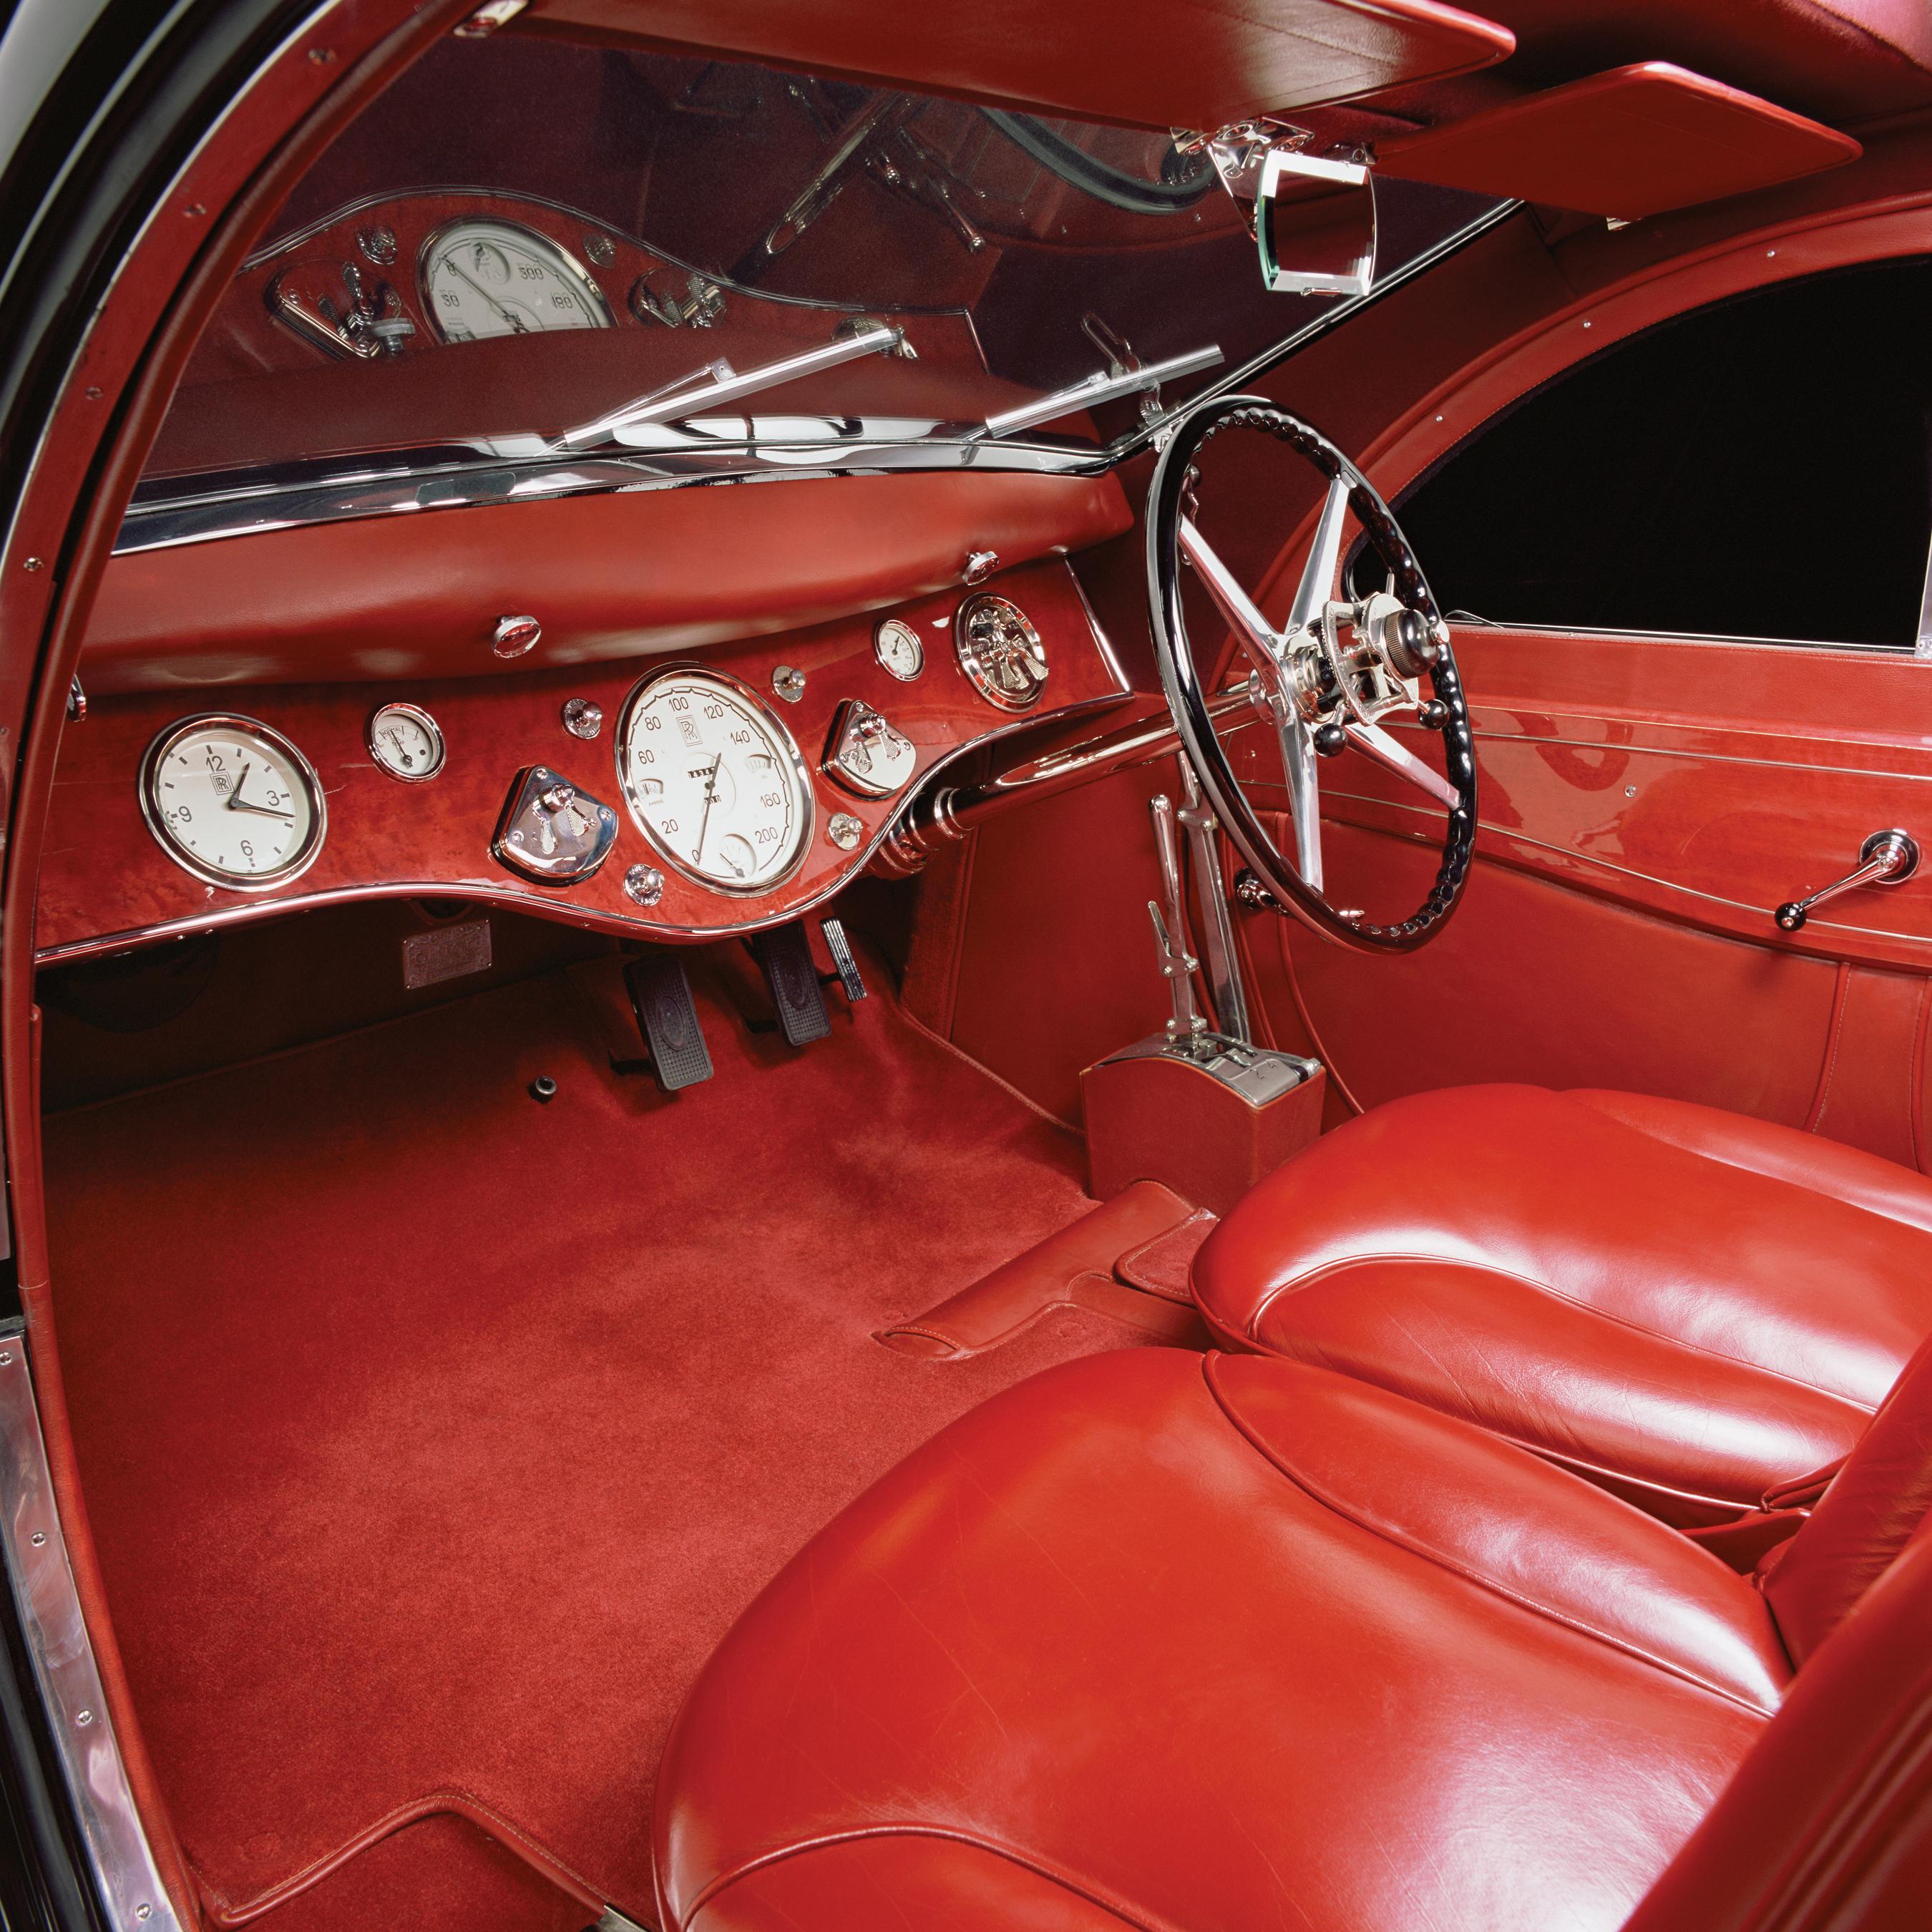 1925 Rolls-royce Phantom Pics, Vehicles Collection